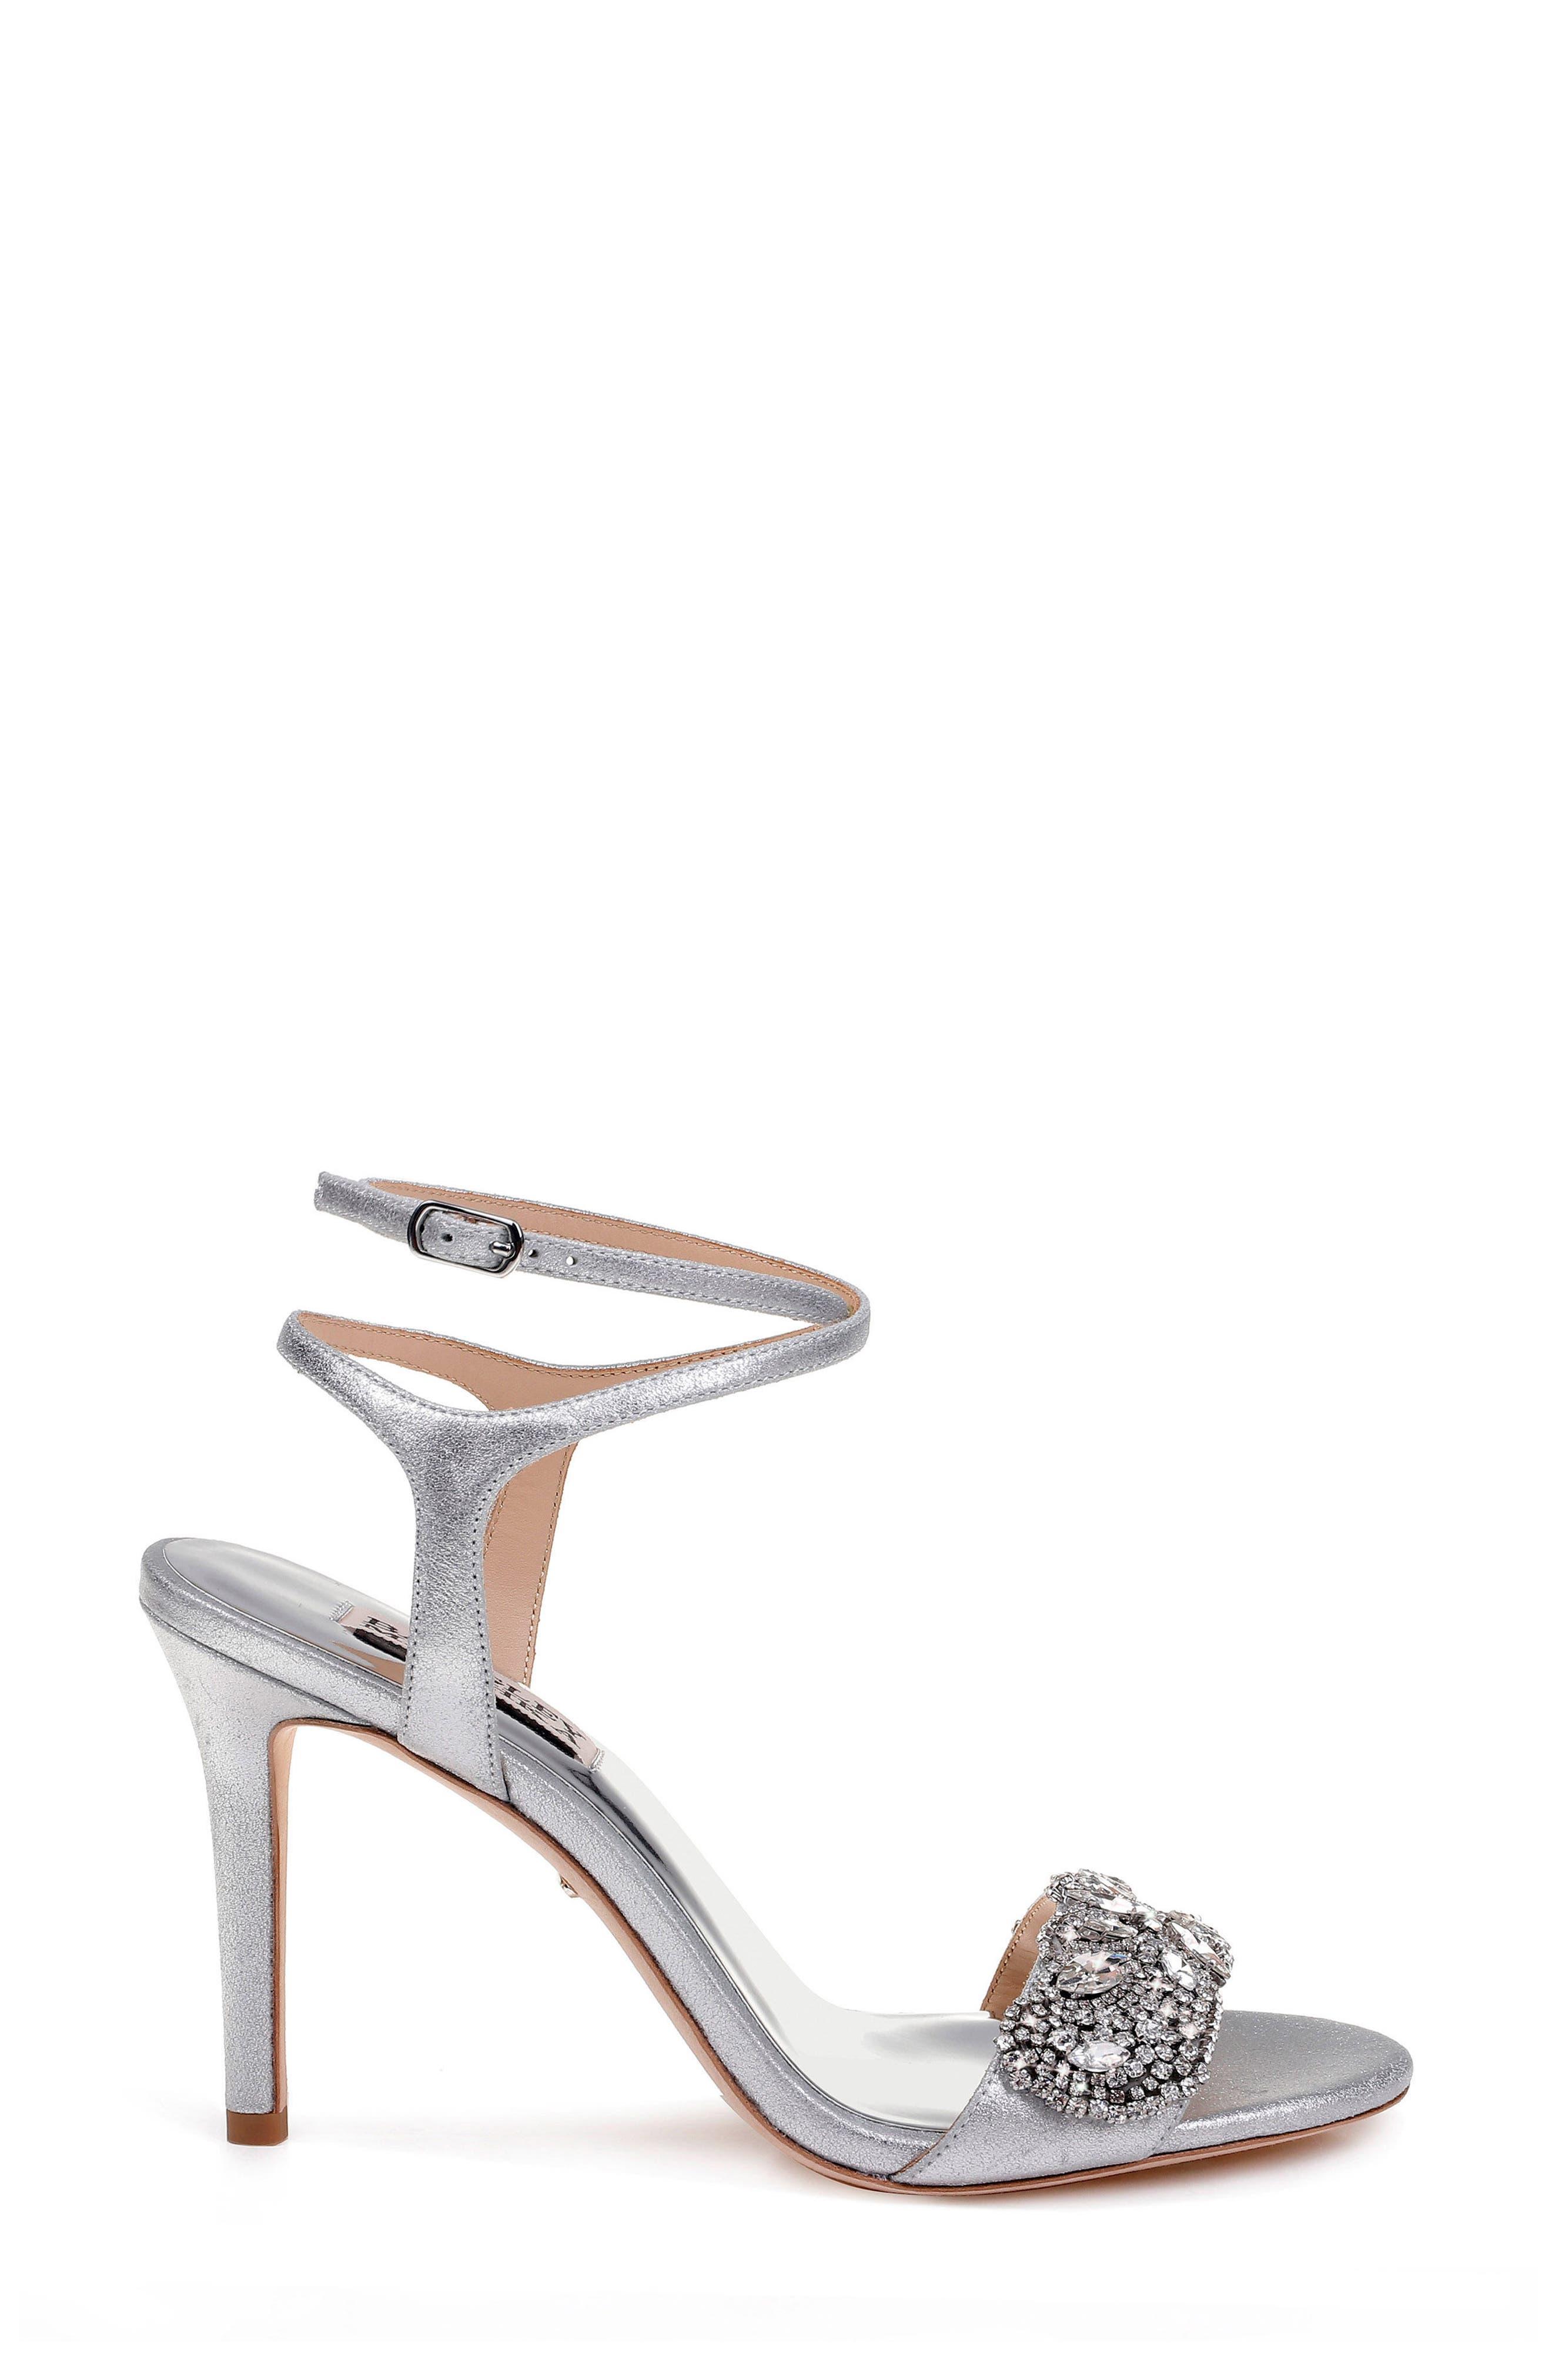 Hailey Embellished Ankle Strap Sandal,                             Alternate thumbnail 3, color,                             Silver Metallic Suede